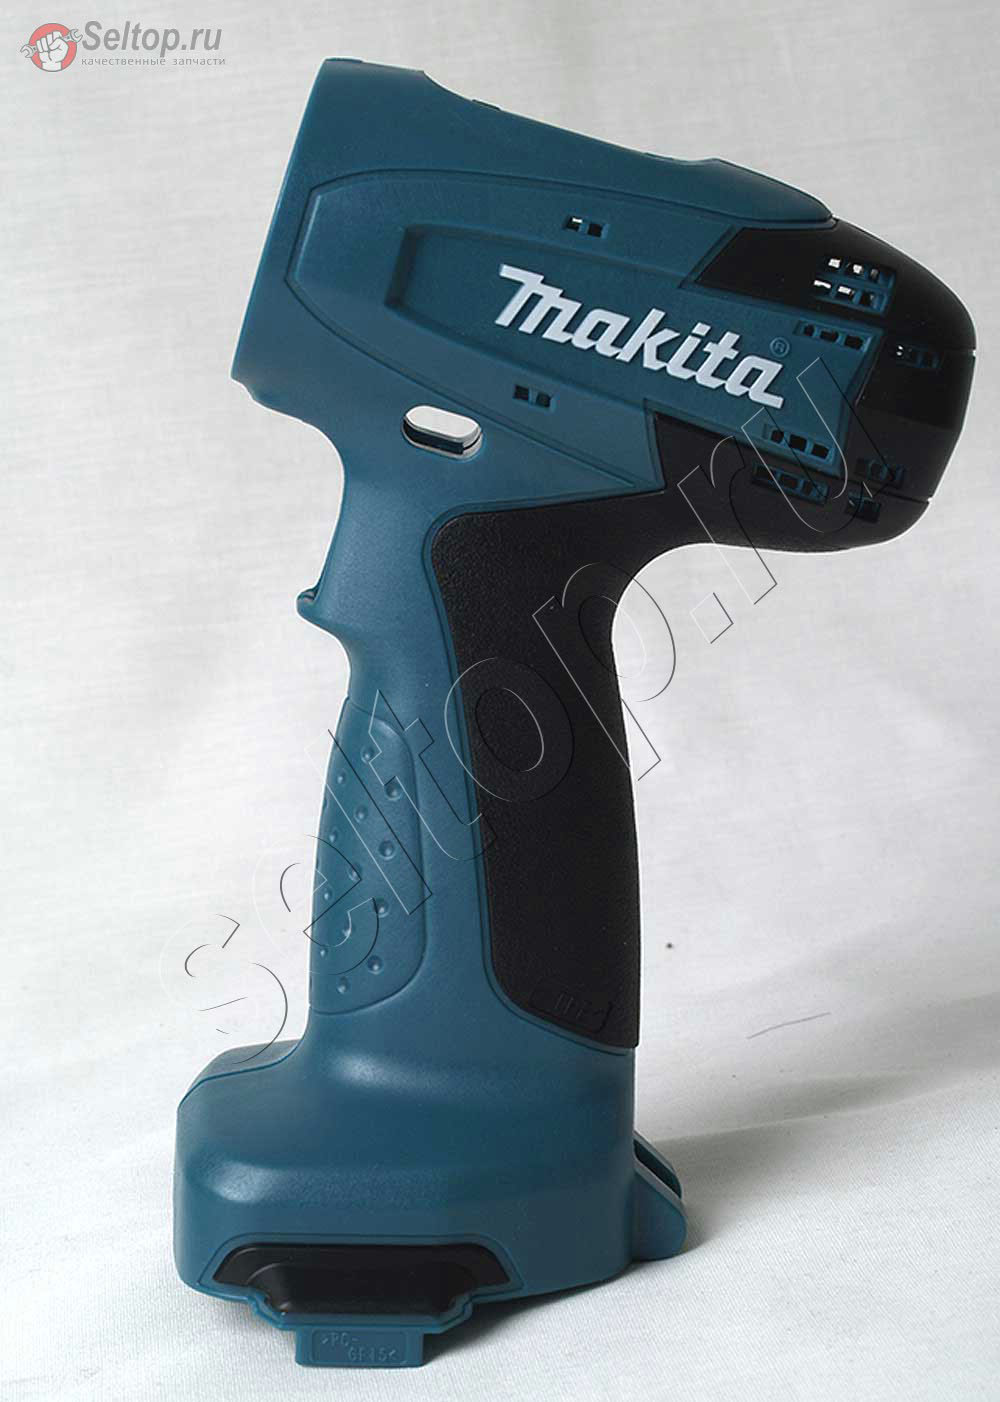 Housing assy to the screwdriver Makita 6271 D|assis|   | АлиЭкспресс